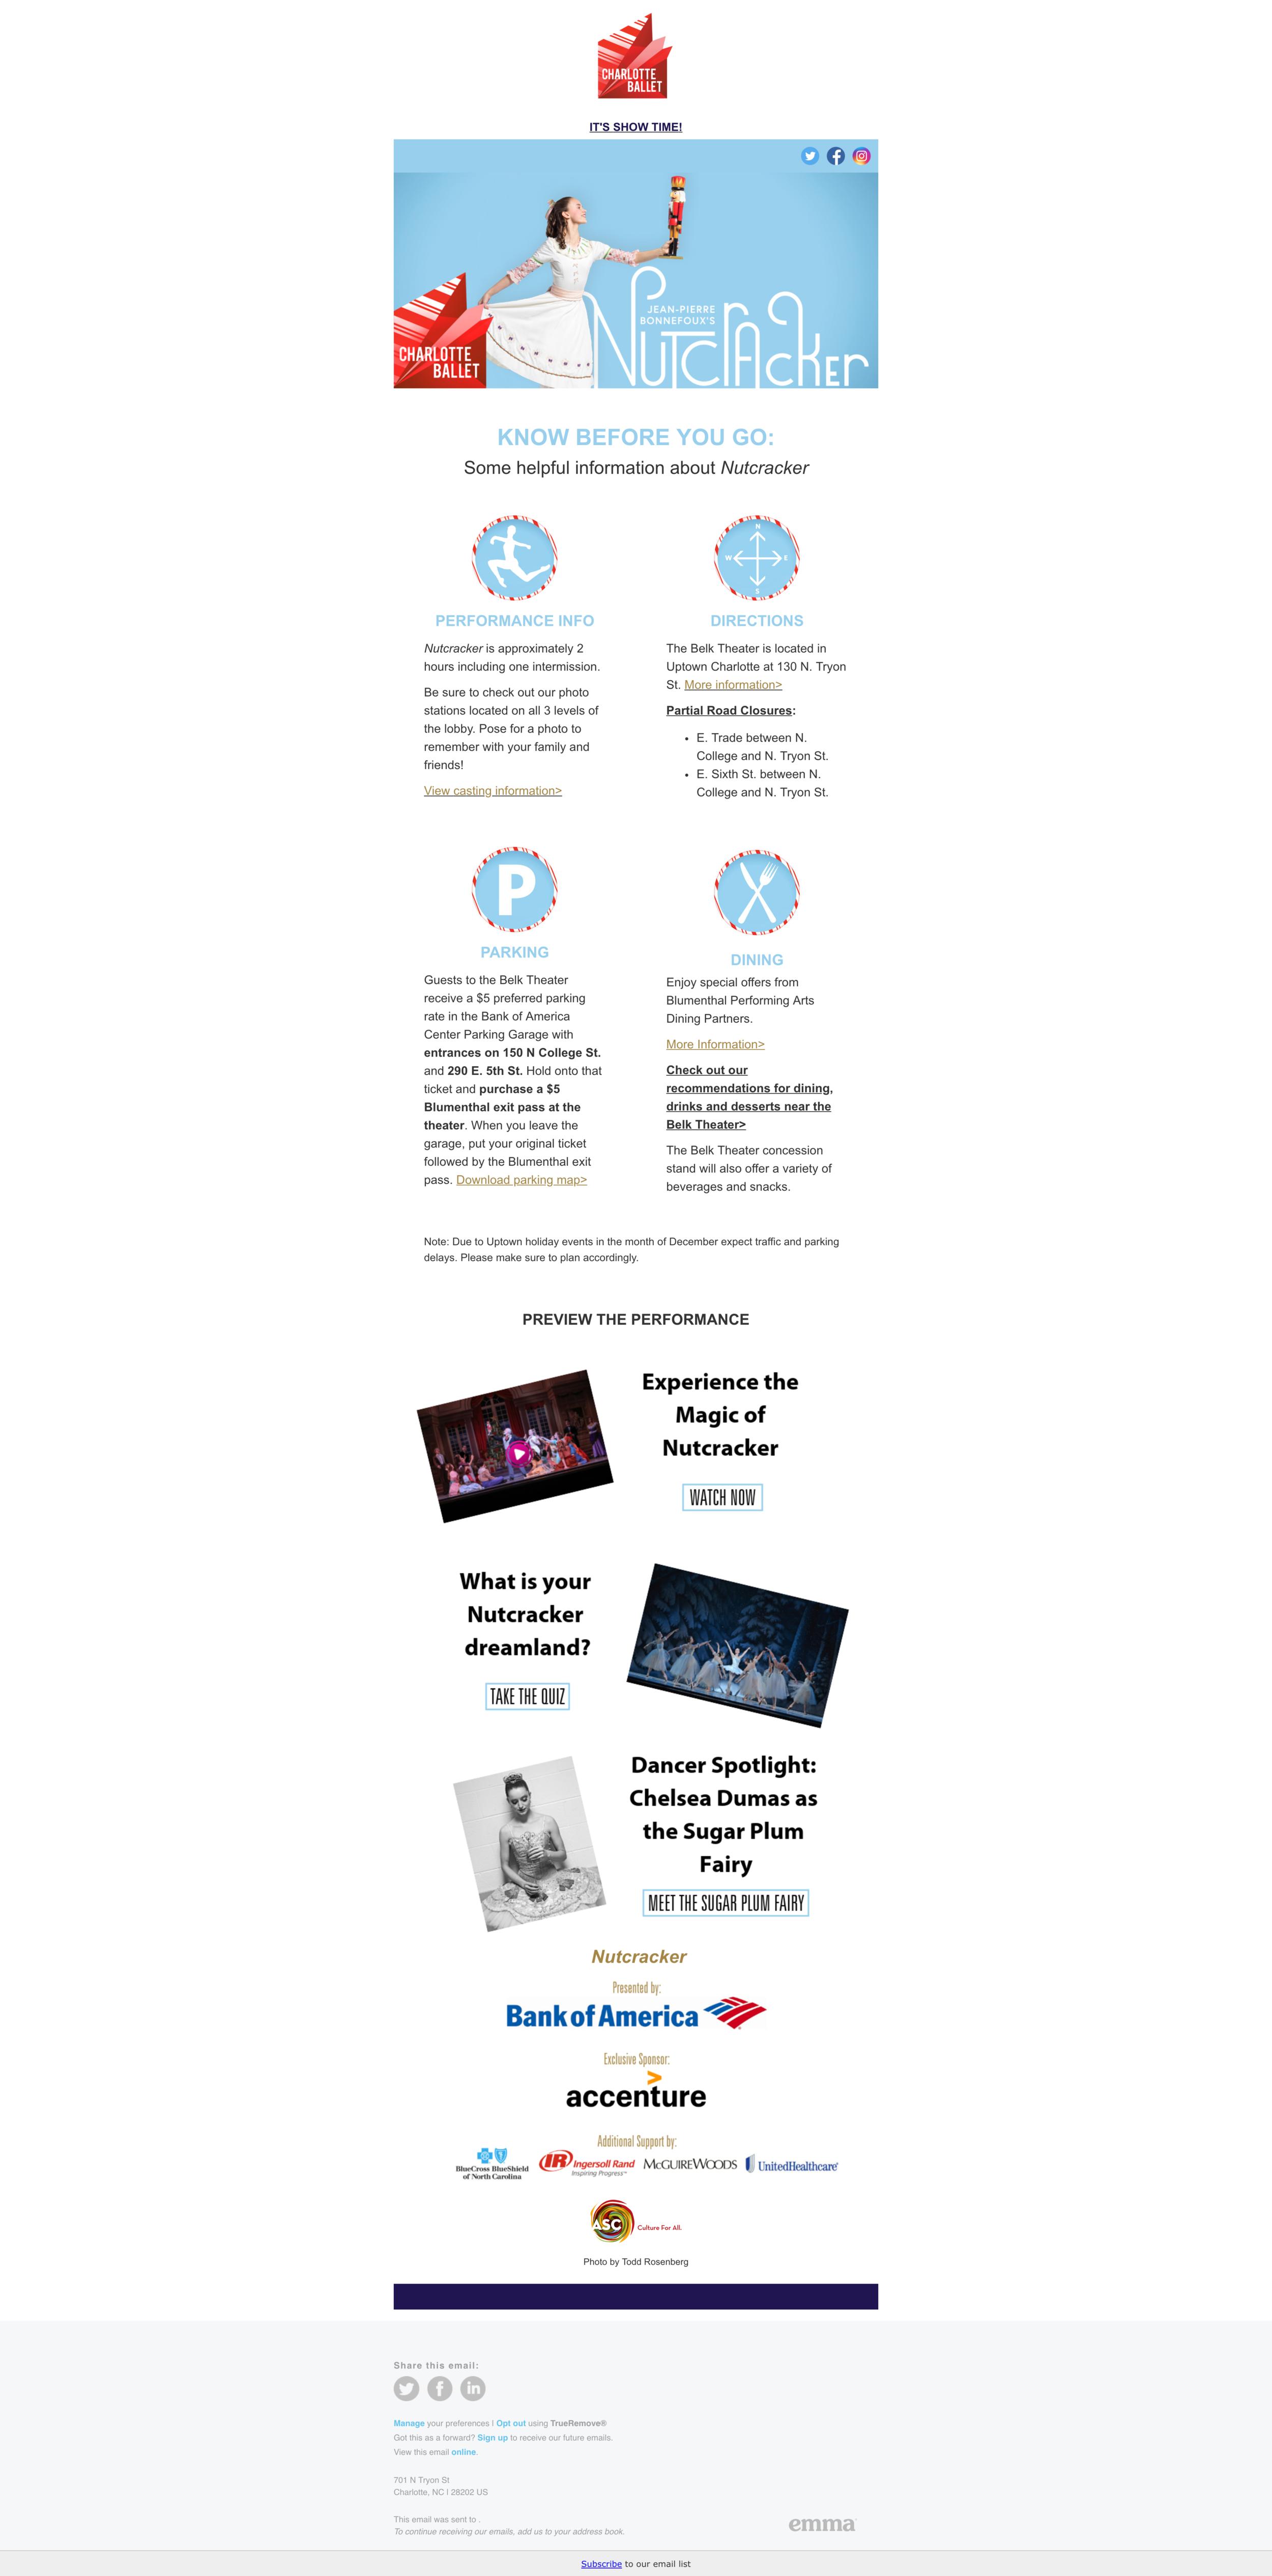 screencapture-t-e2ma-net-webview-t0r2ue-bbb37b8096ee9edffc4a0b9340641259-2019-04-14-11_55_56.png